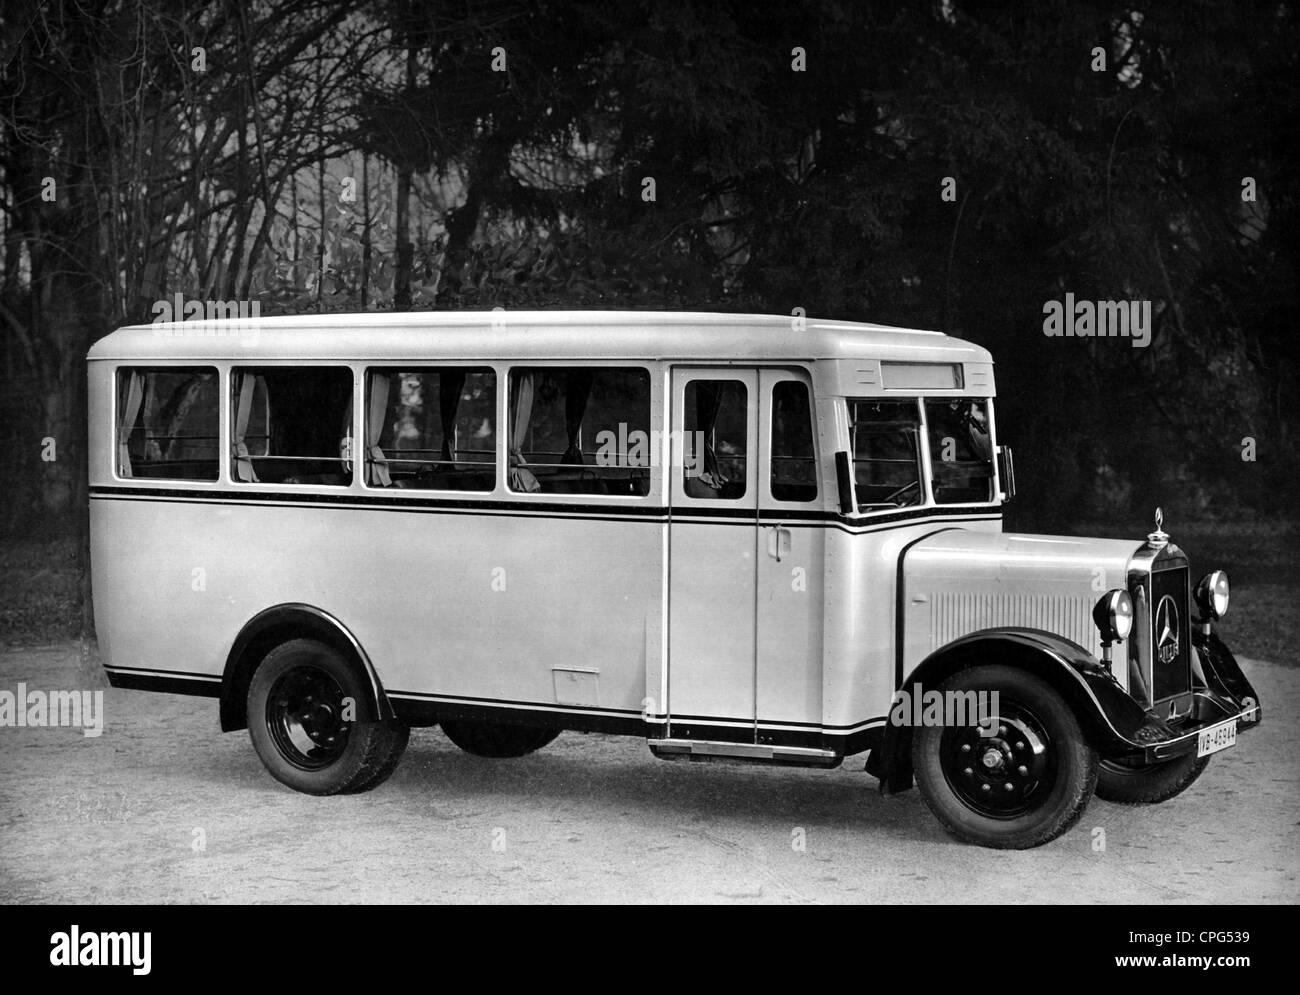 Transport Transportation Car Vehicle Variants